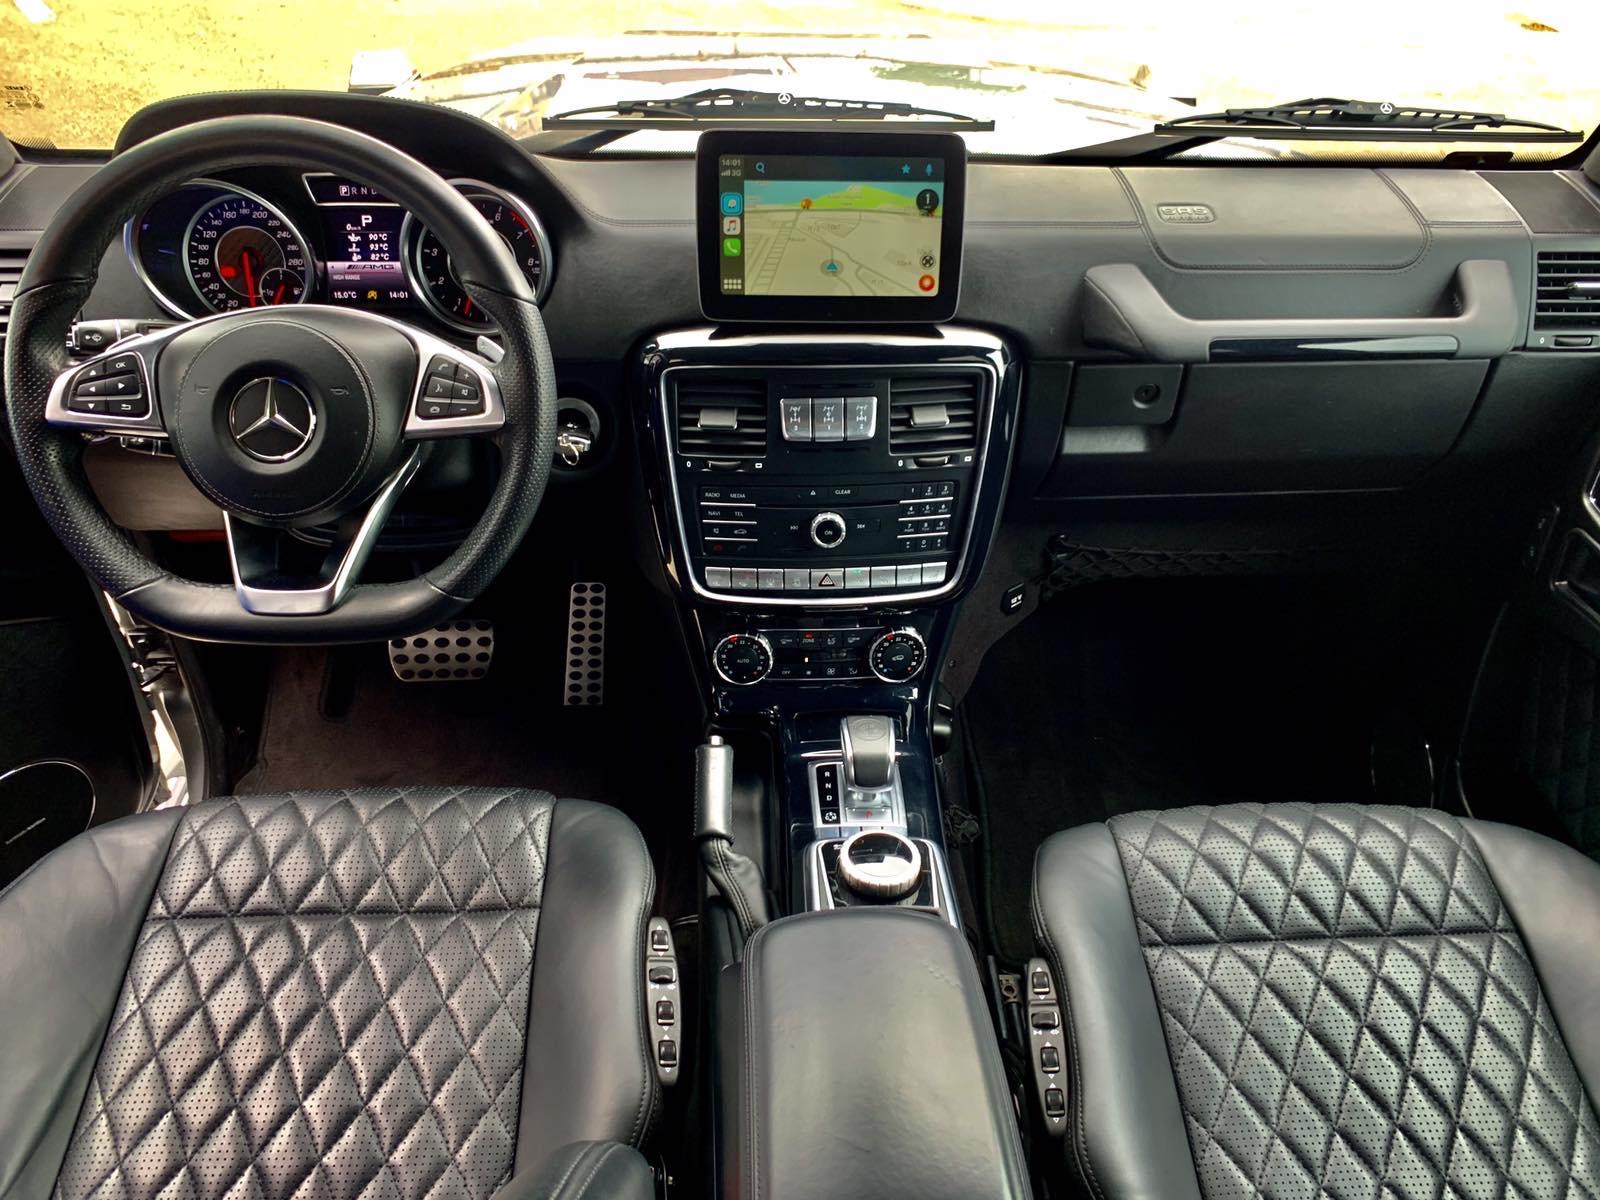 Mercedes G63AMG (7)